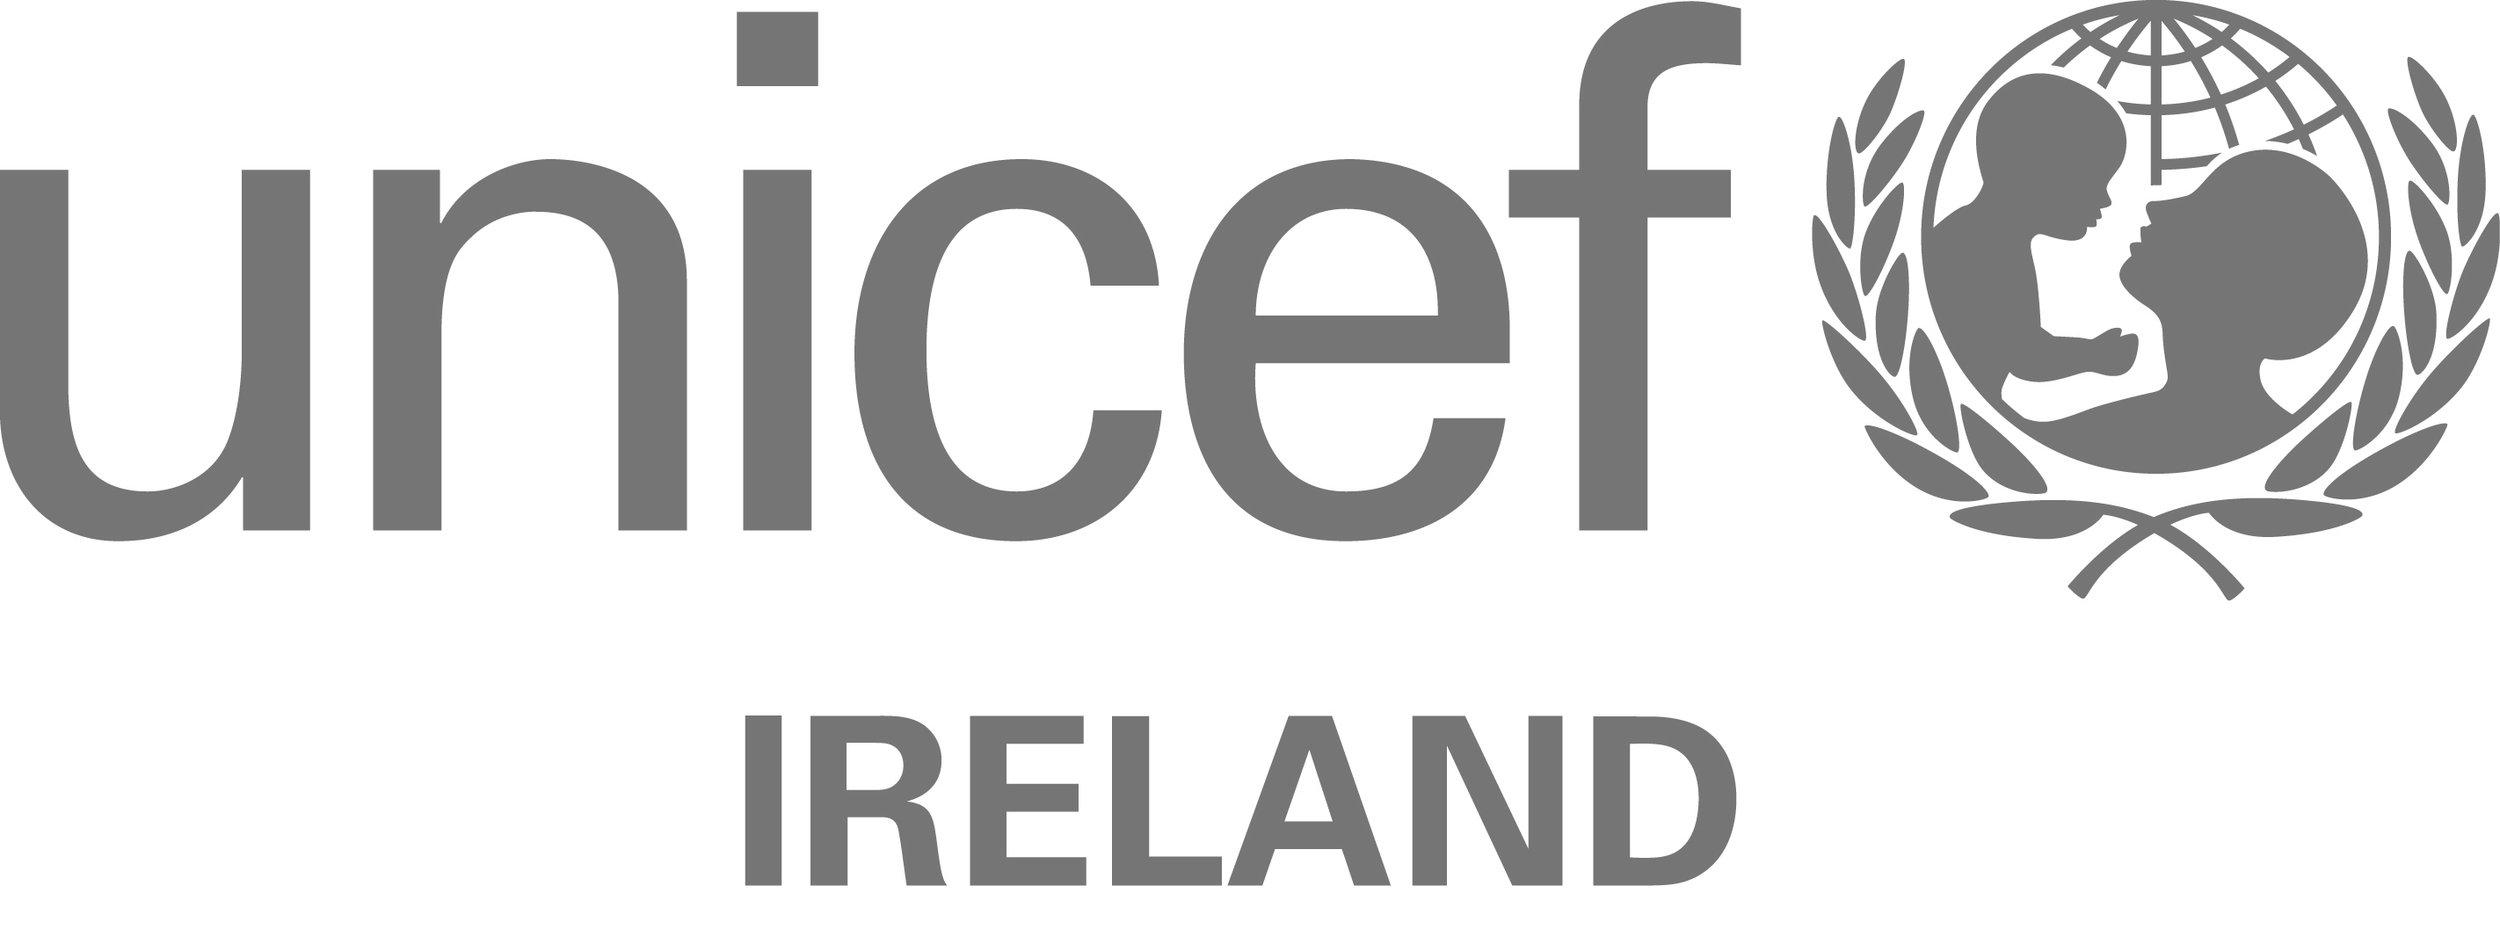 unicef_logo_colour_Ireland copy.jpg